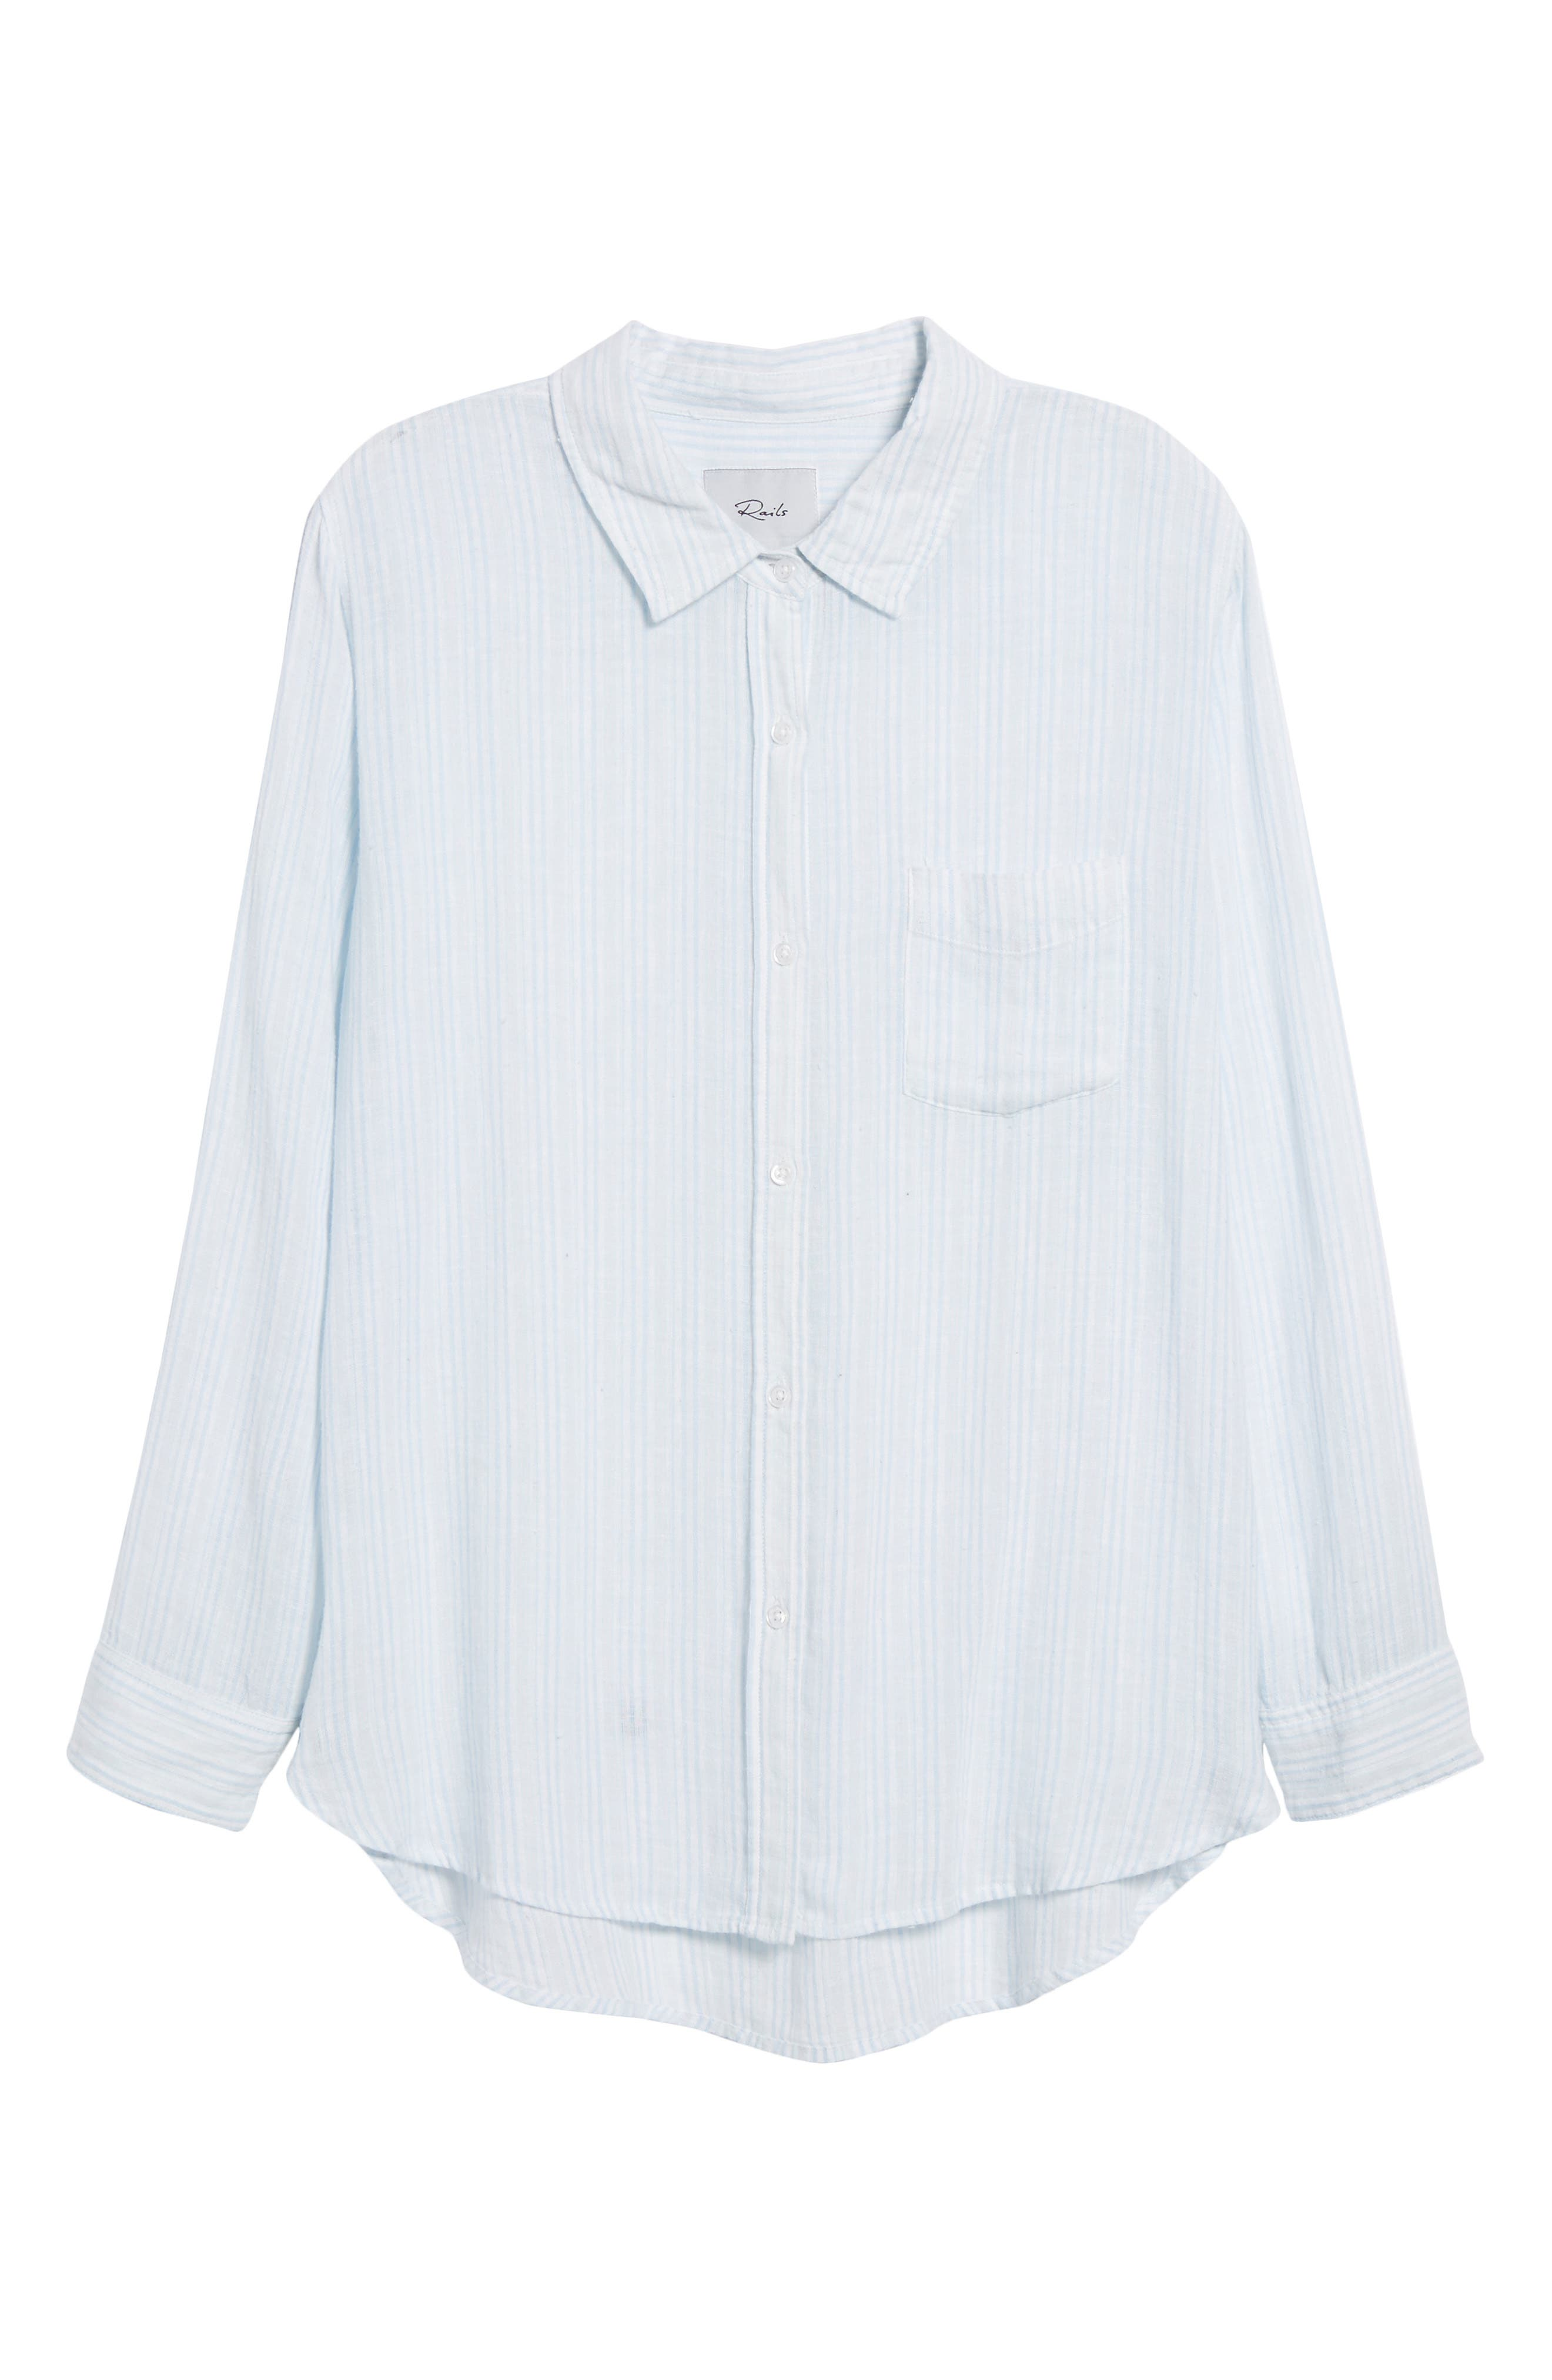 Charli Stripe Shirt,                             Alternate thumbnail 6, color,                             Playa Stripe